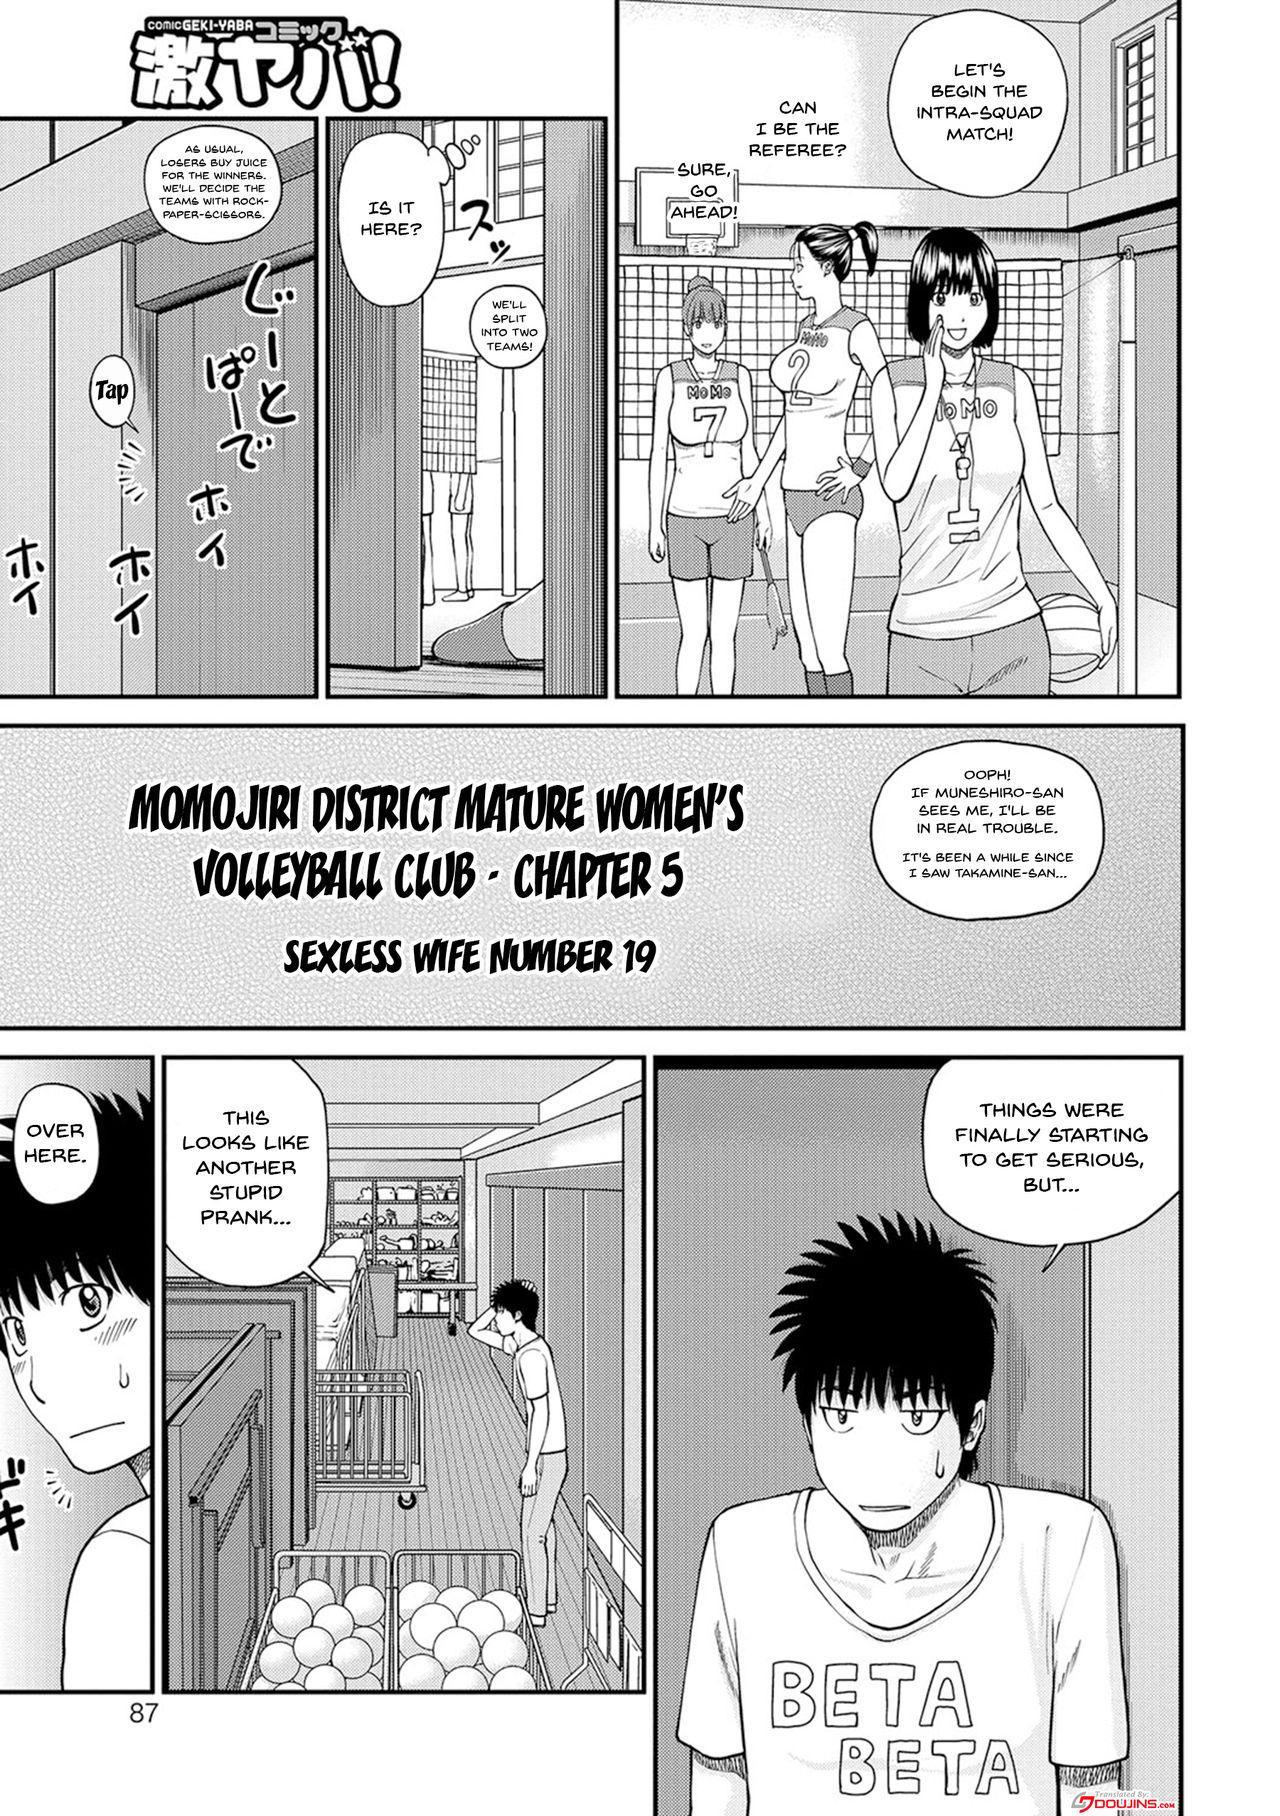 [Kuroki Hidehiko] Momojiri Danchi Mama-san Volley Doukoukai - Mom's Volley Ball | Momojiri District Mature Women's Volleyball Club Ch.1-9 [English] {Doujins.com} [Digital] 83